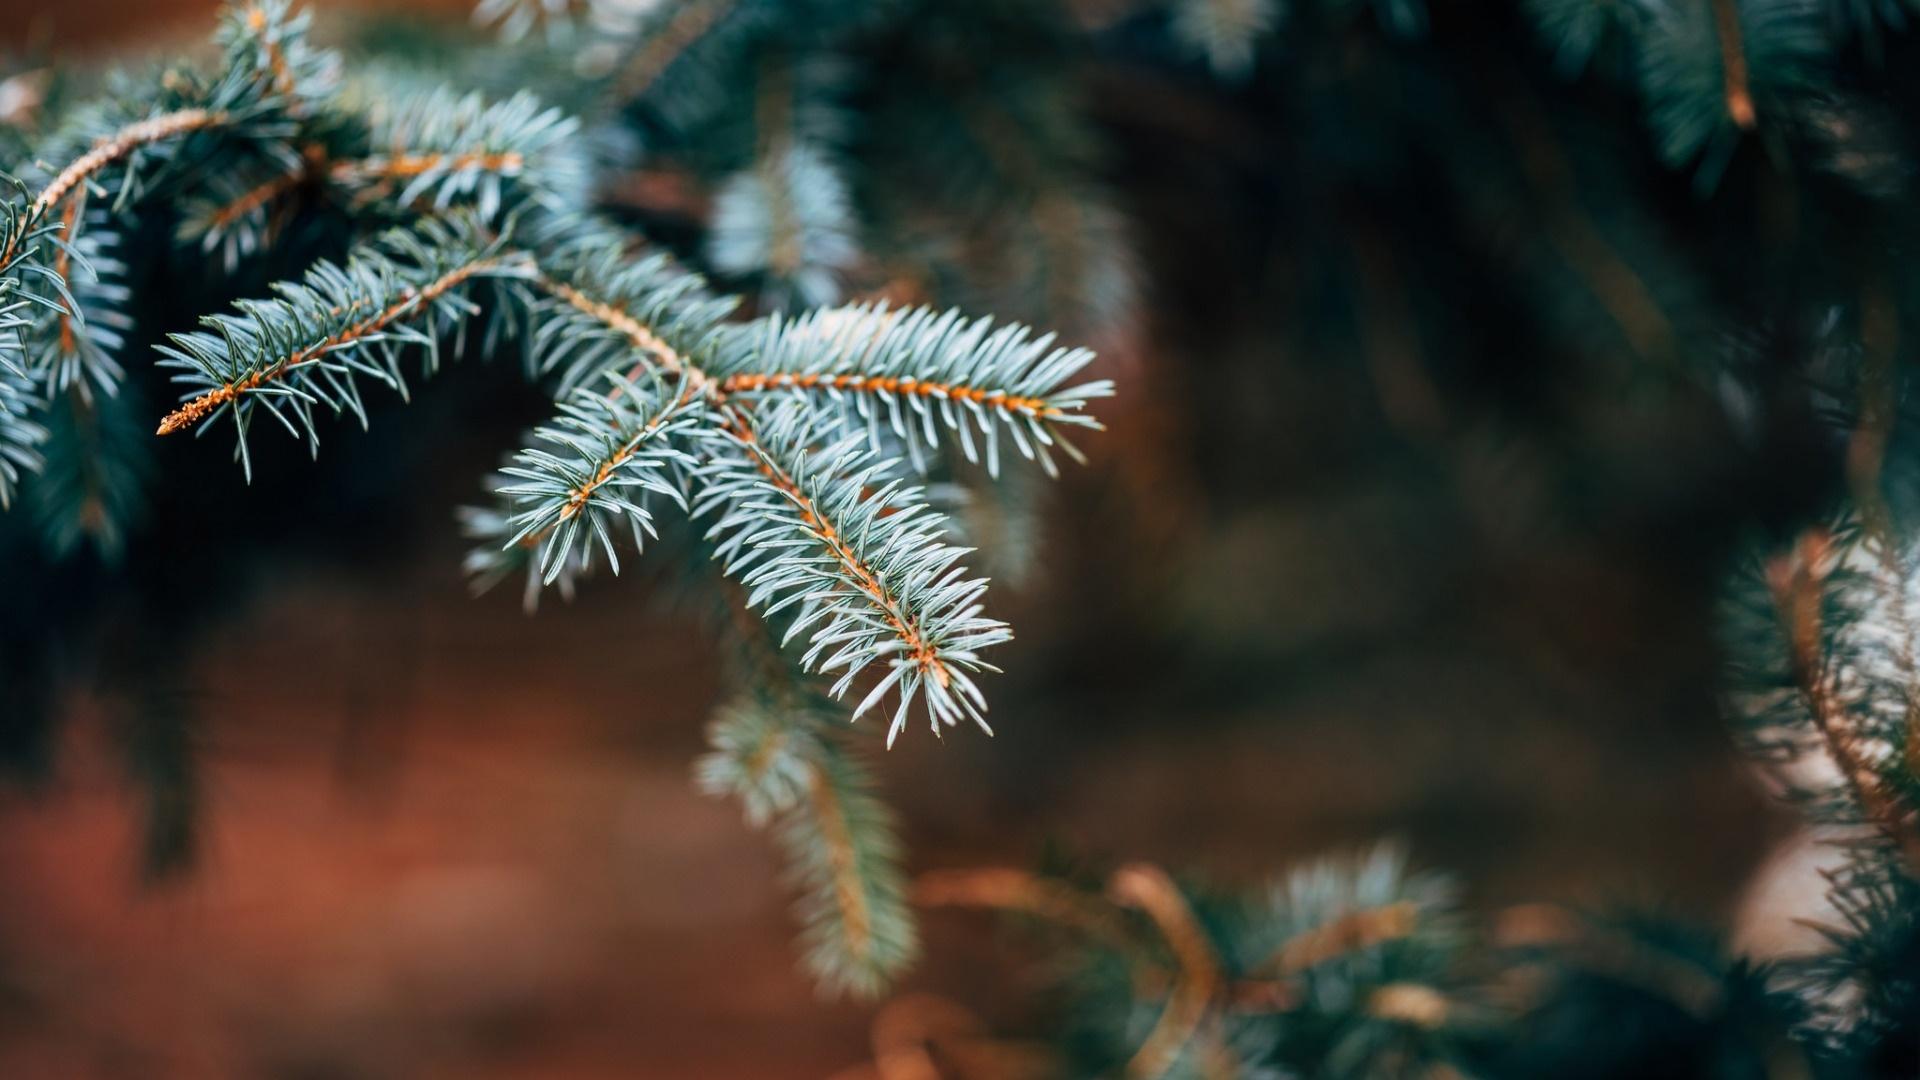 Spruce Branches Desktop Wallpaper